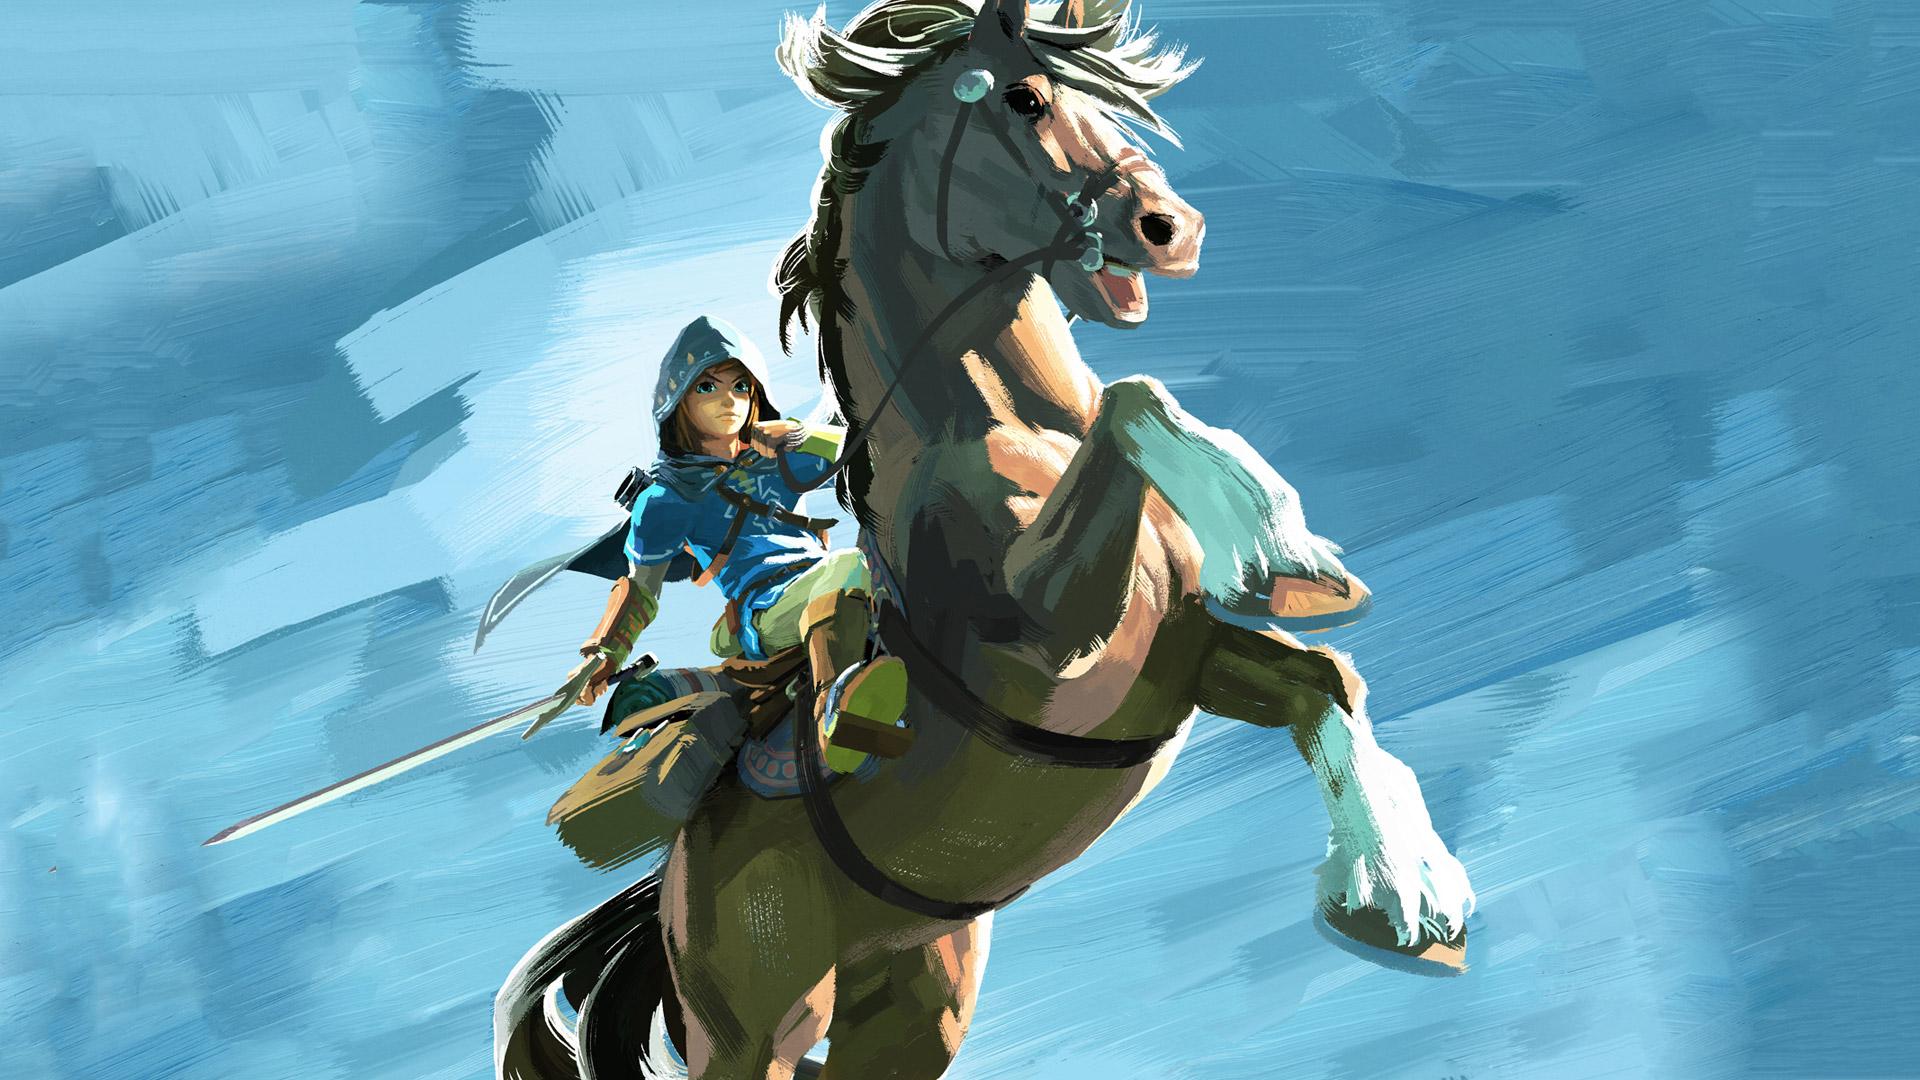 Free The Legend of Zelda: Breath of the Wild Wallpaper in 1920x1080